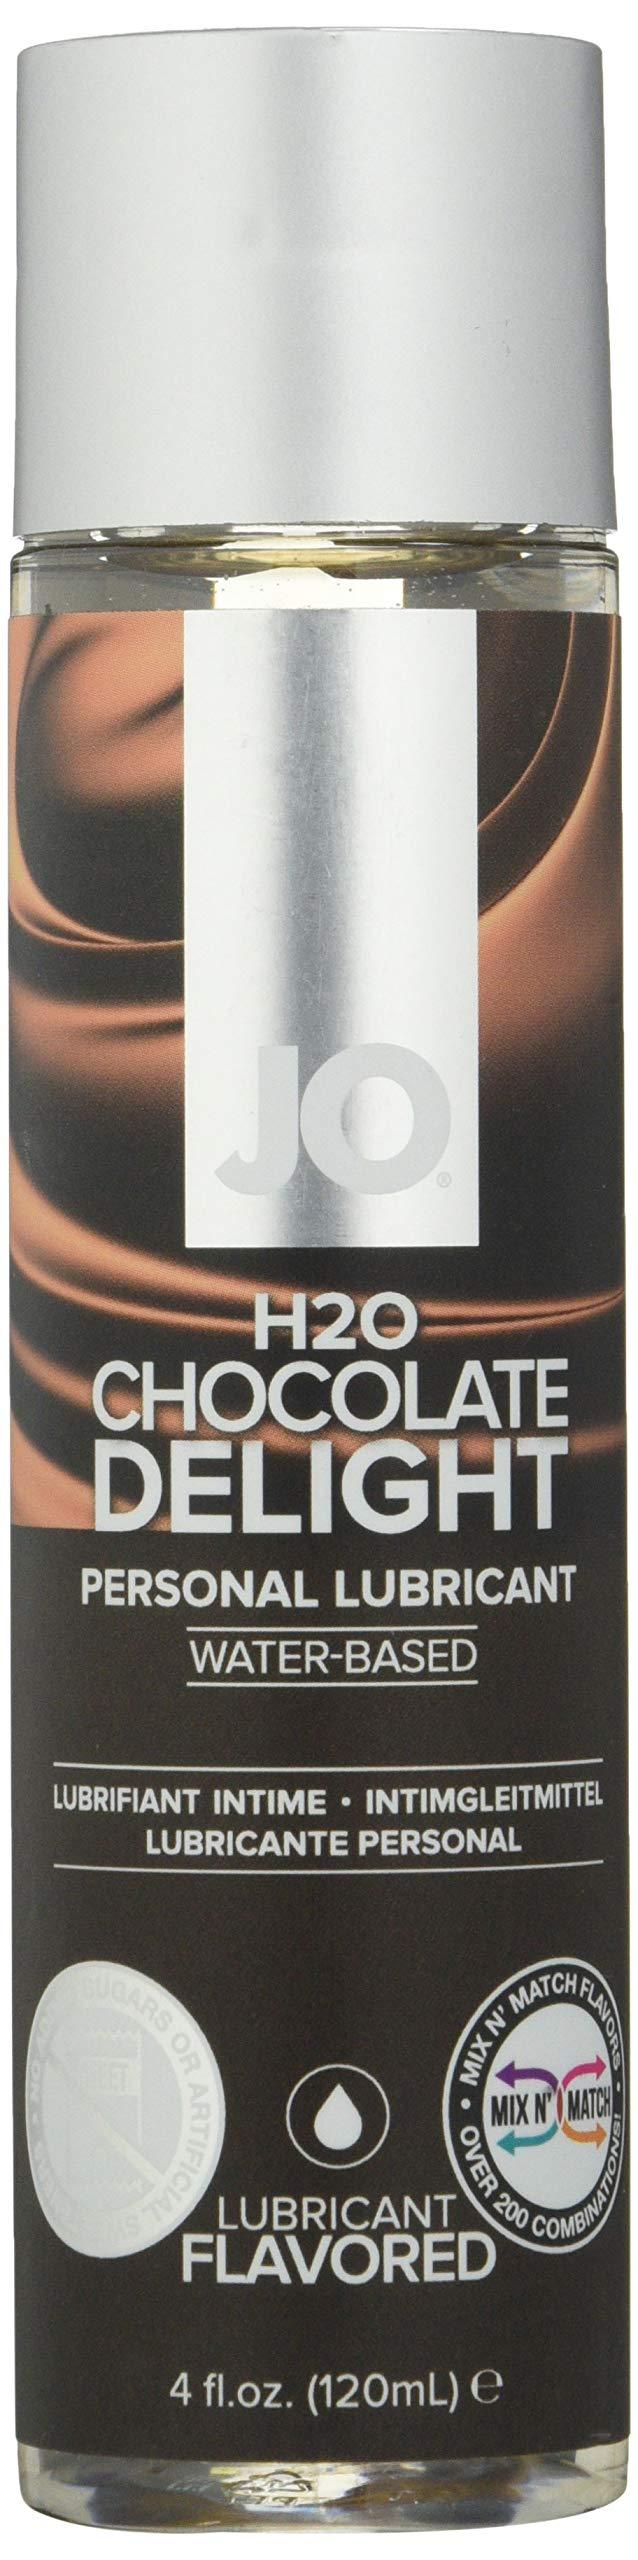 JO H2O Flavored - Chocolate (4 oz)